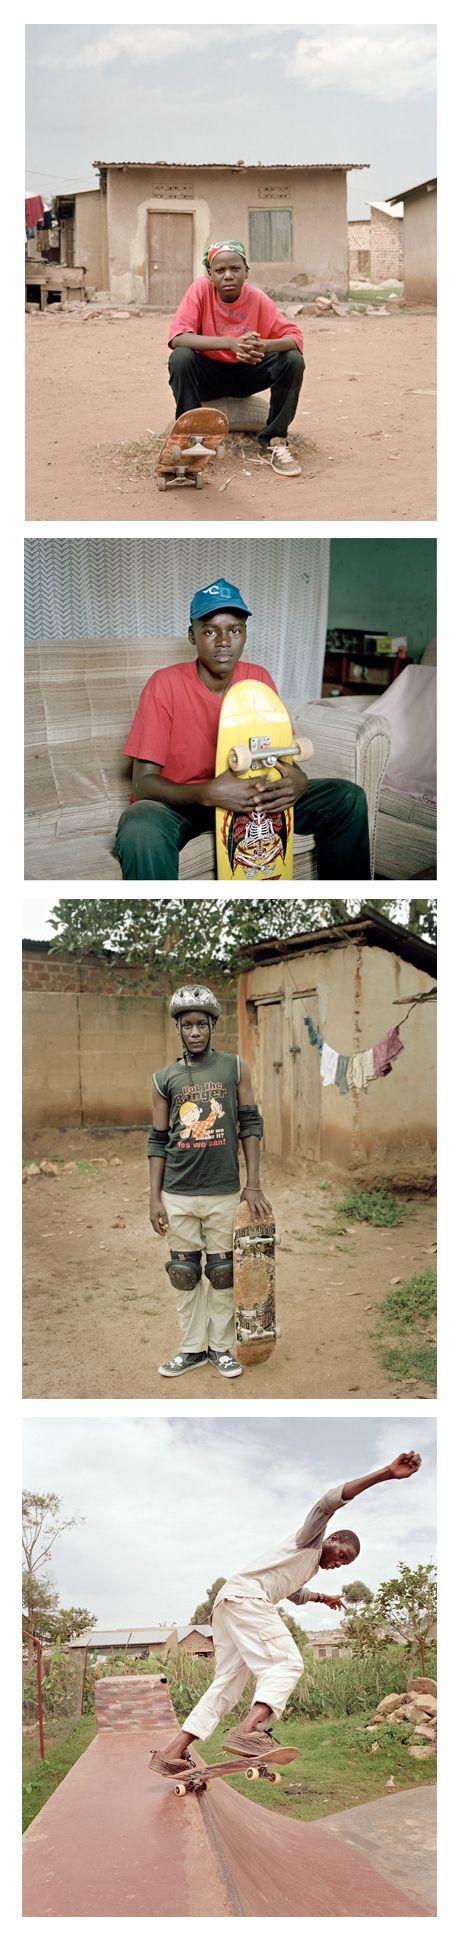 Uganda Skaters by Yann Gross